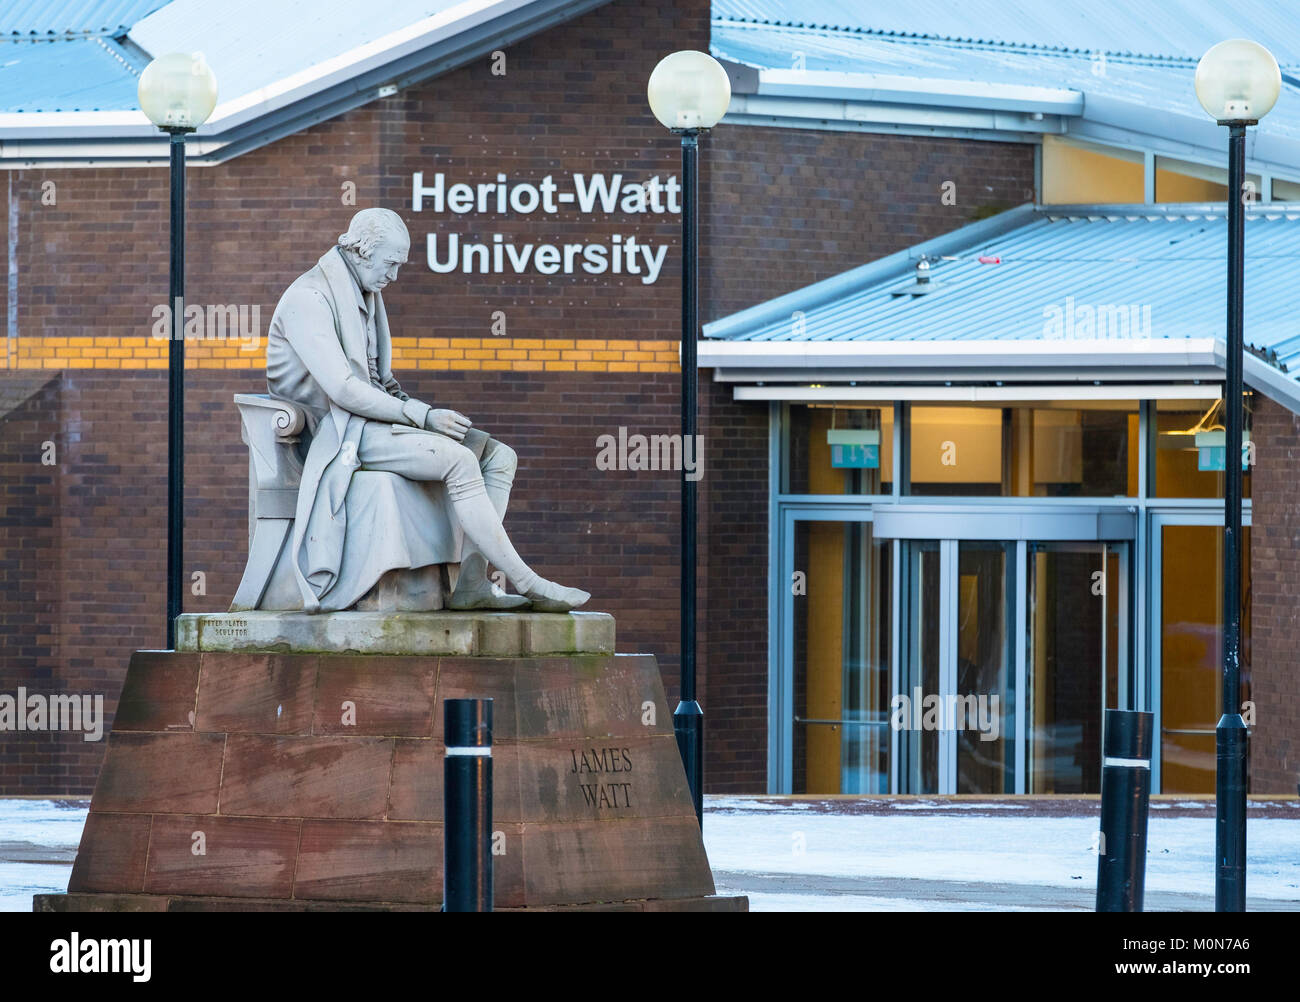 Heriot watt university stock photos heriot watt - University of edinburgh international office ...